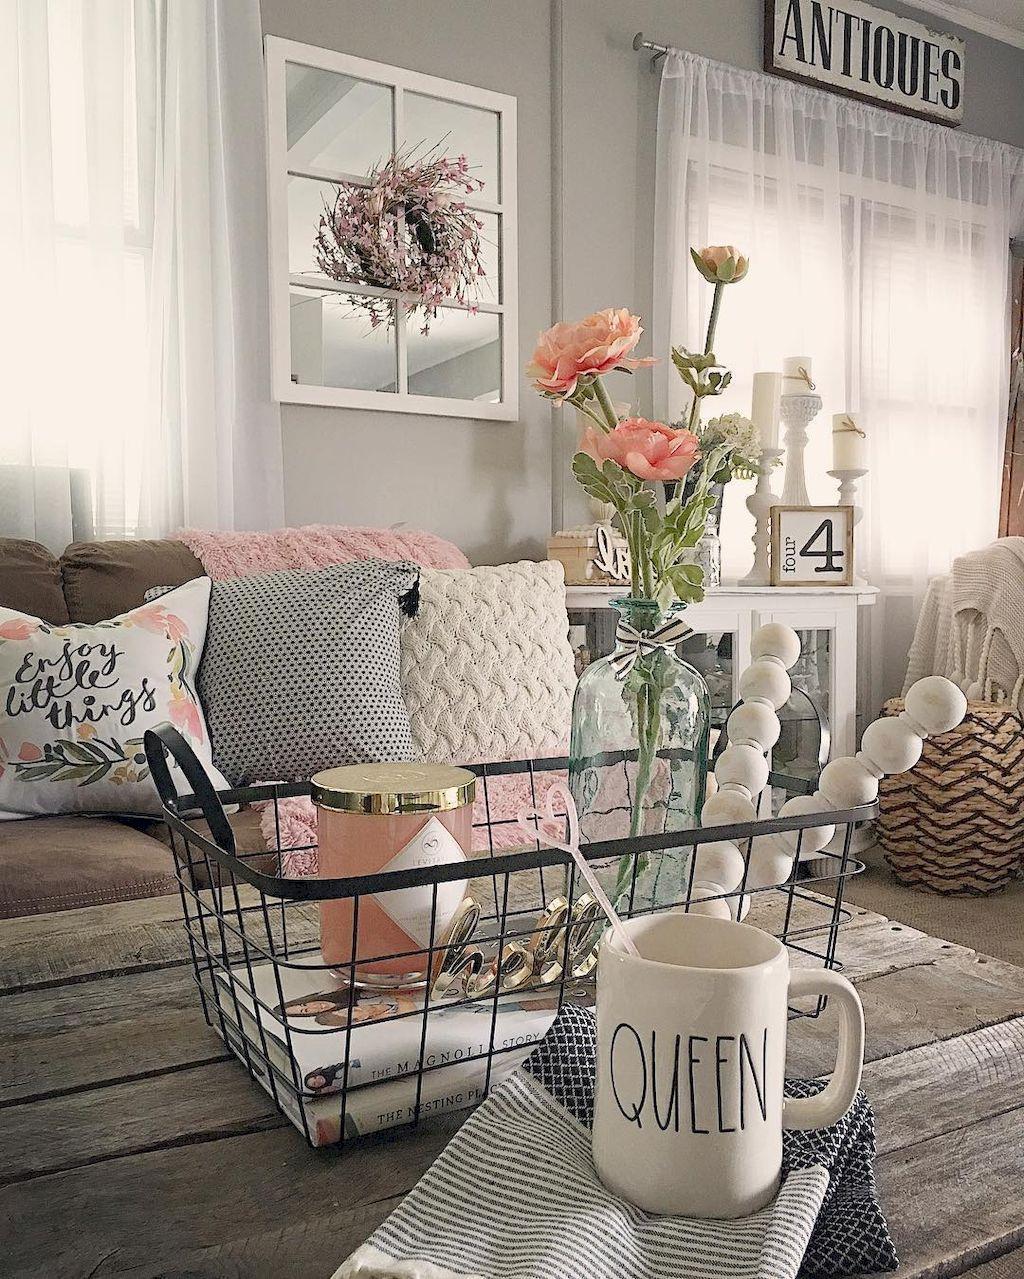 25 Beautiful Shabby Chic Interior Designs And Ideas Farm House